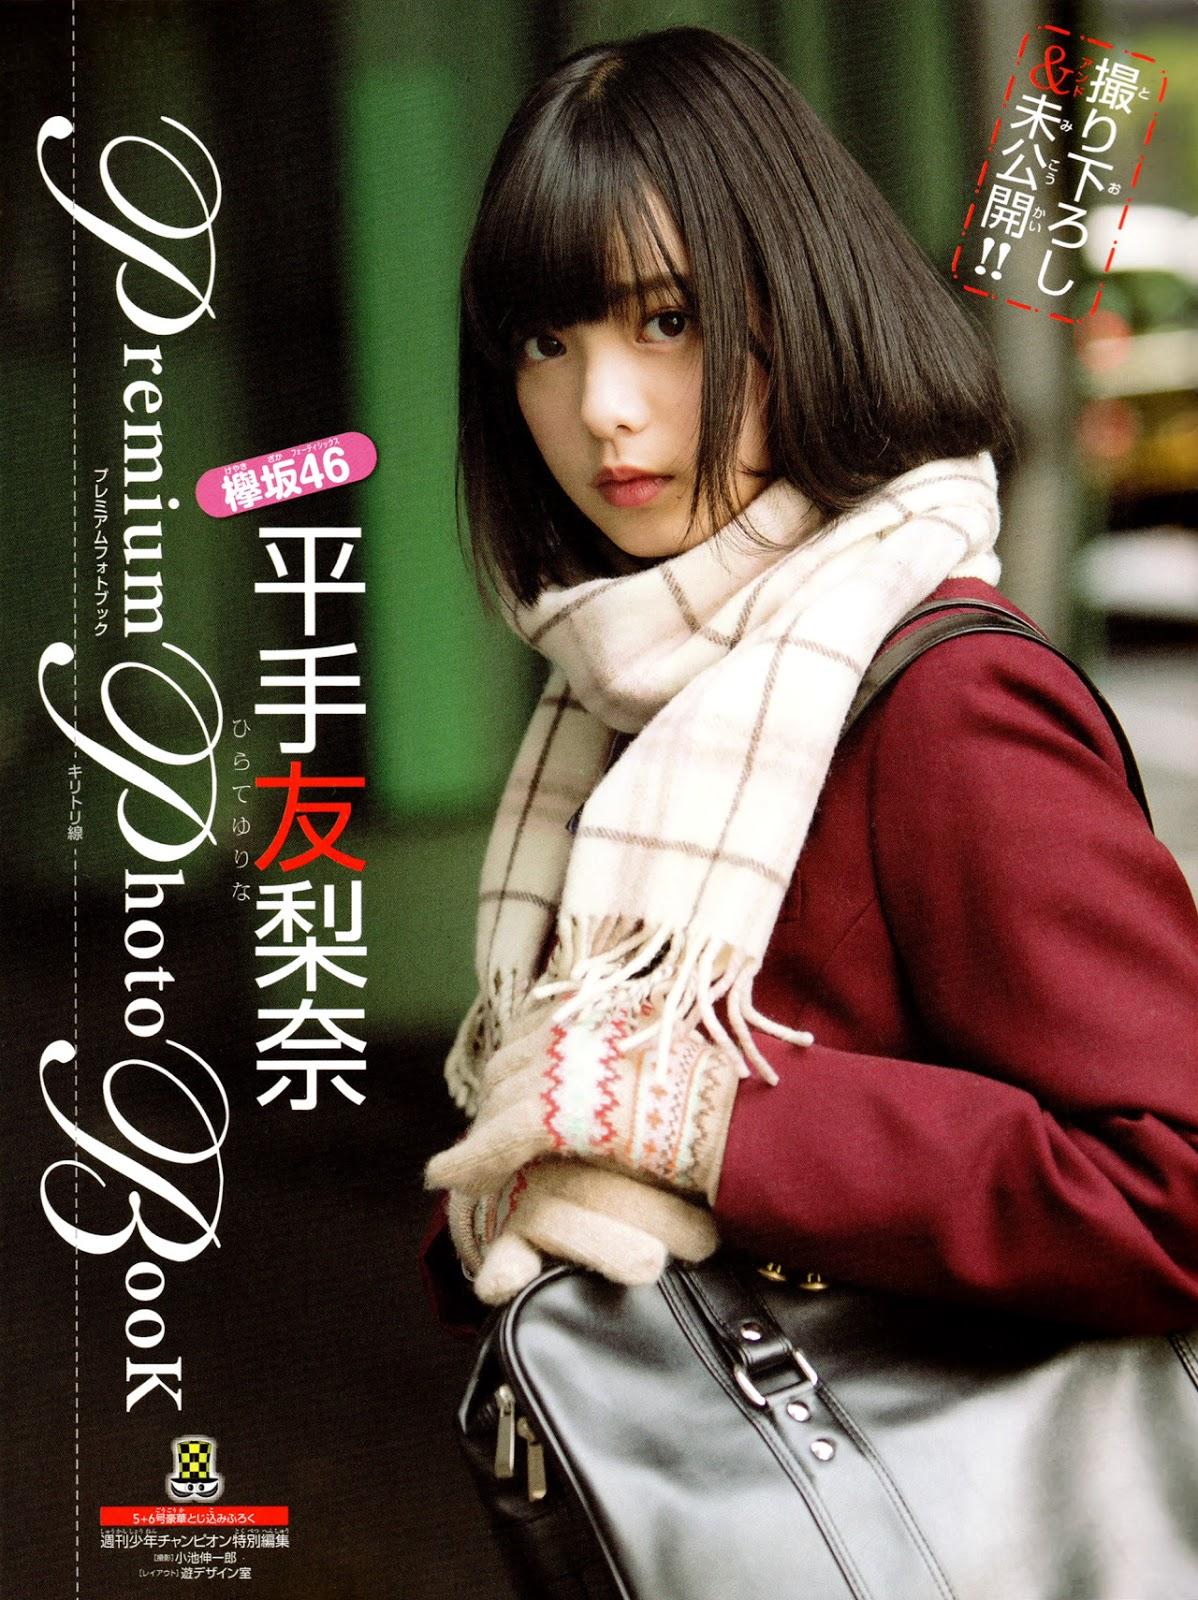 Hirate Yurina 平手友梨奈 Keyakizaka46, Shonen Champion 2017.01.12 No.05-06 (週刊少年チャンピオン 2017年05-06合併号)